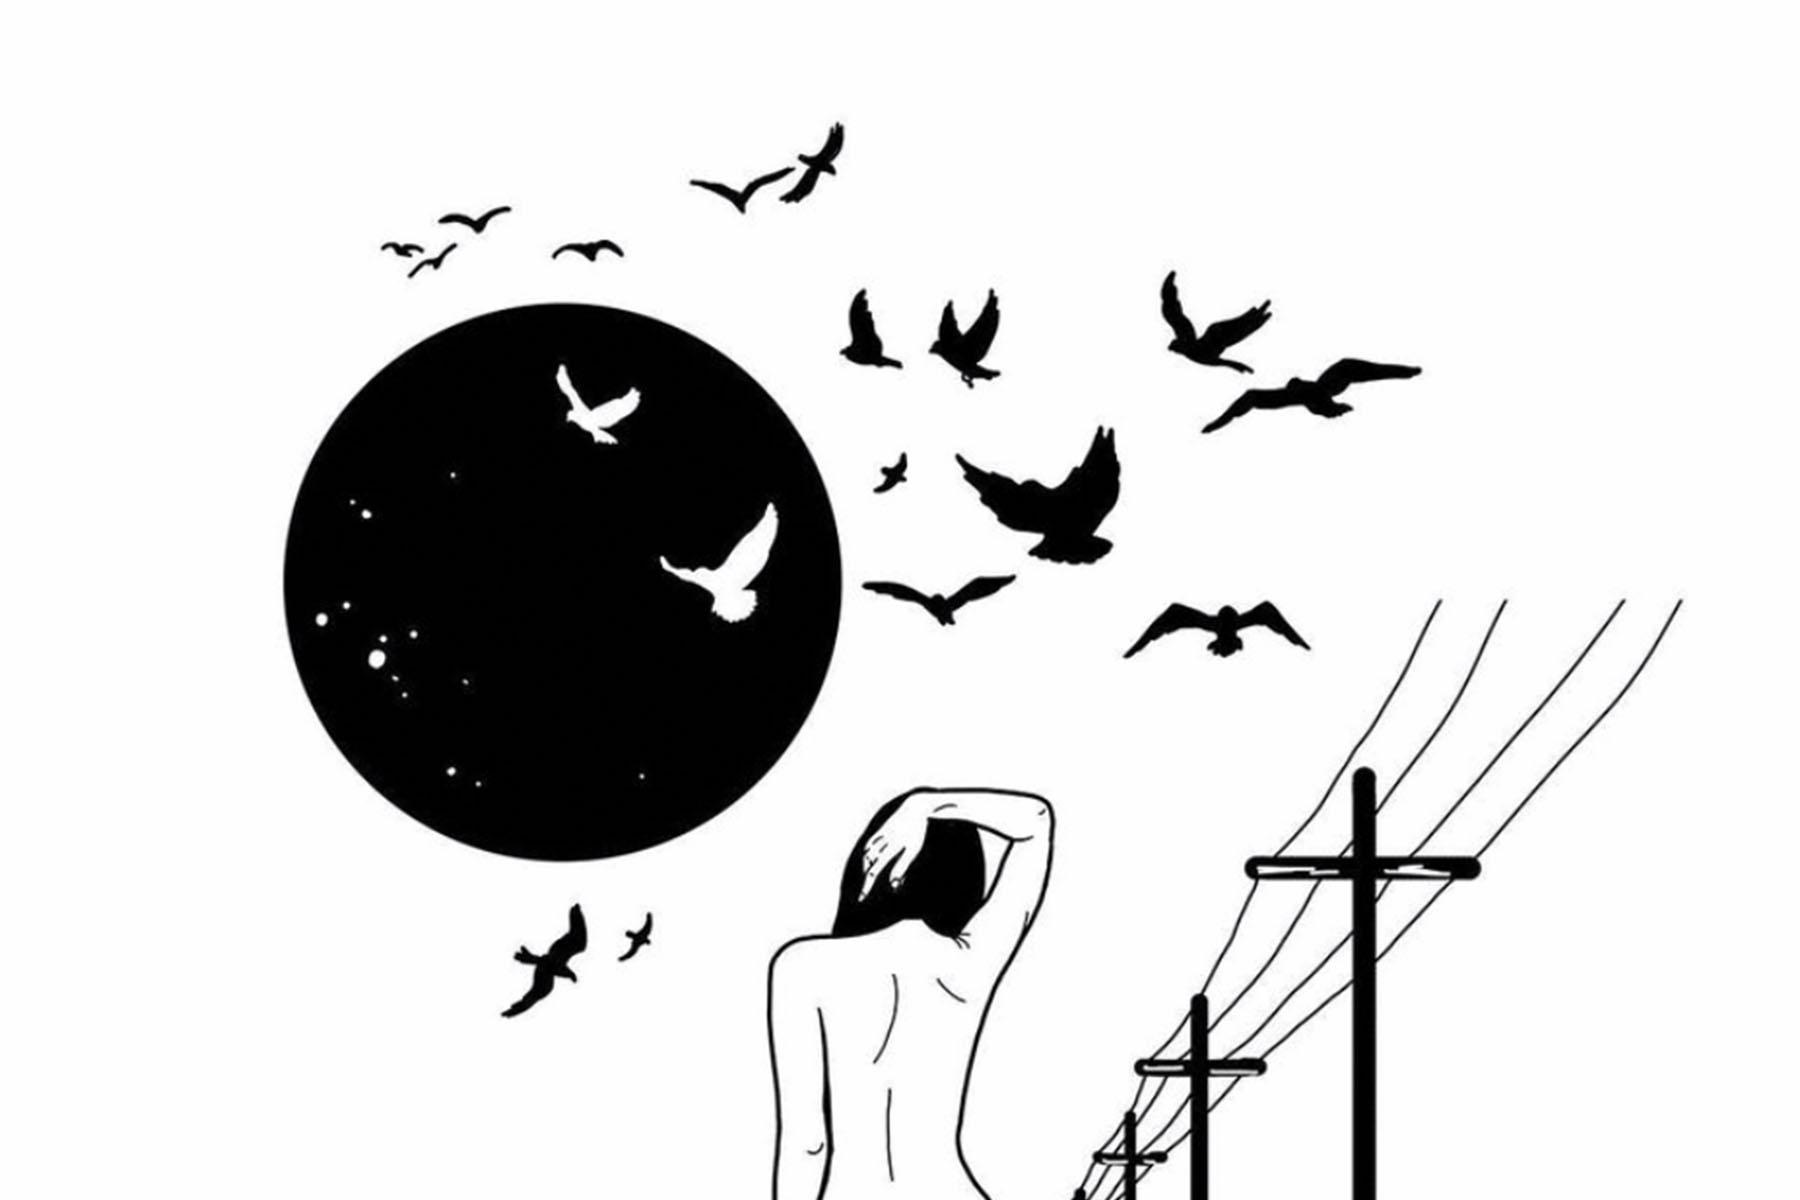 December 2020 New Moon Solar Eclipse in Sagittarius